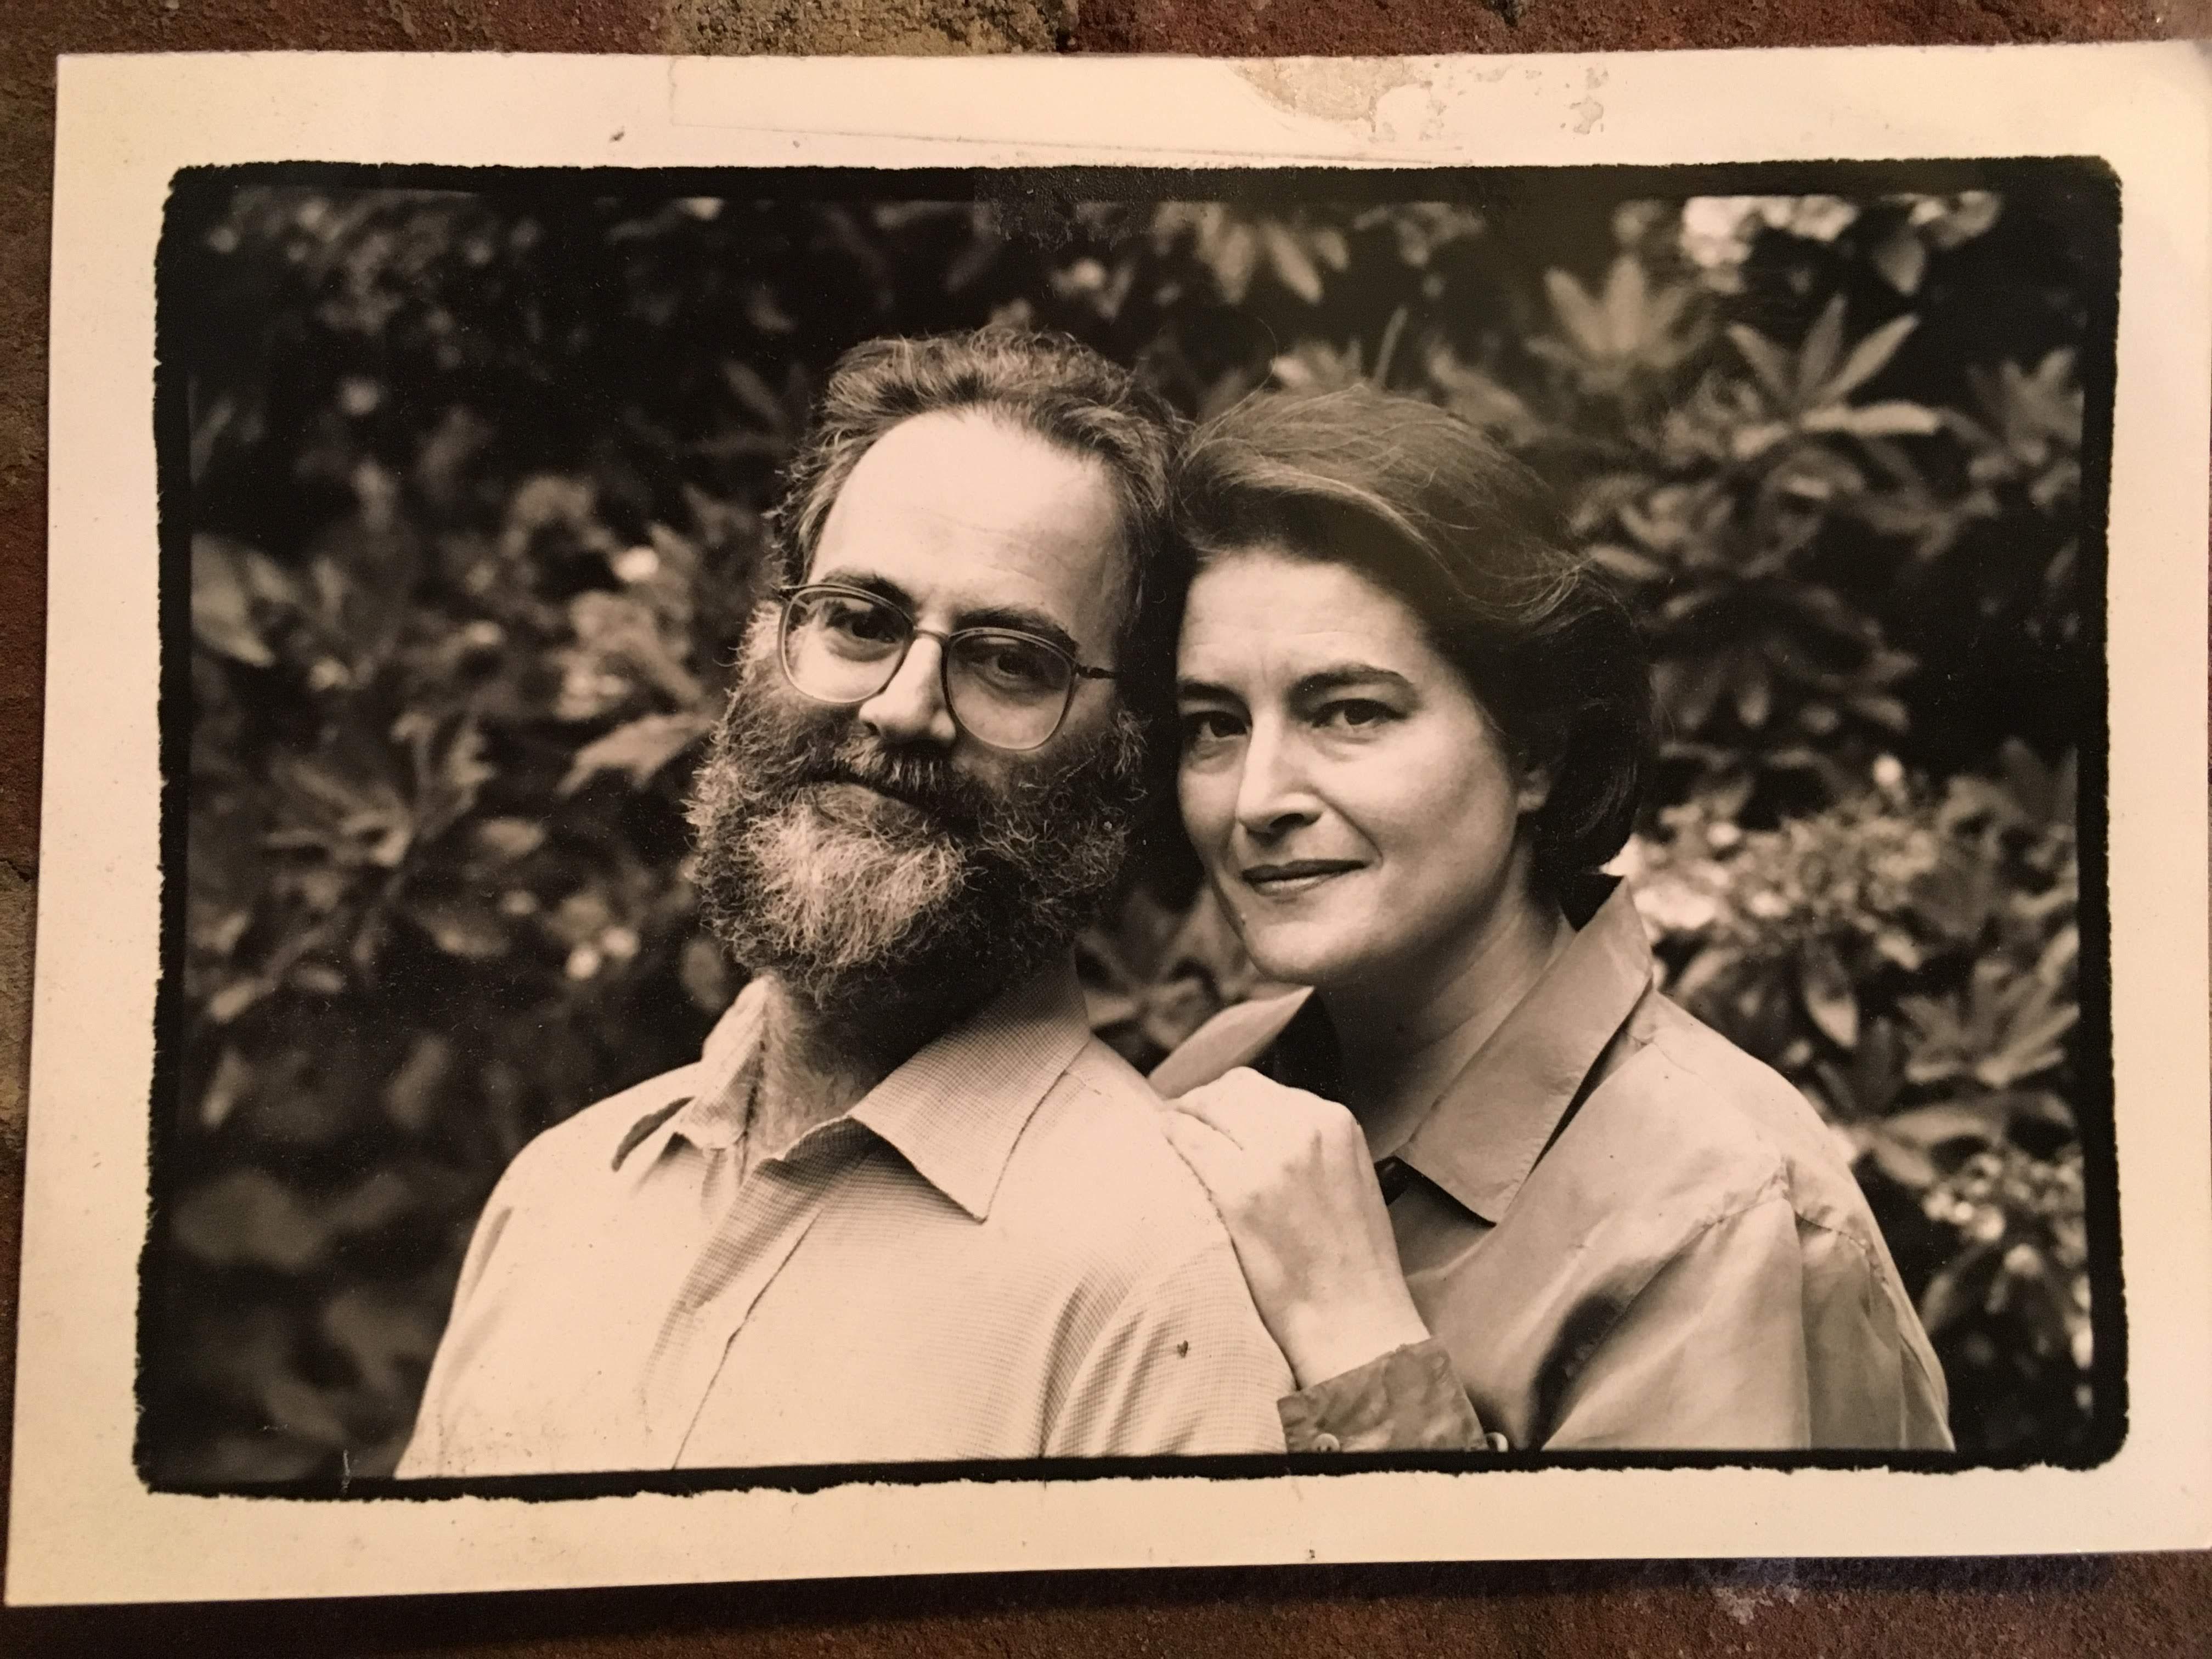 My fathers testament: memoir of a Jewish teenager, 1938-1945